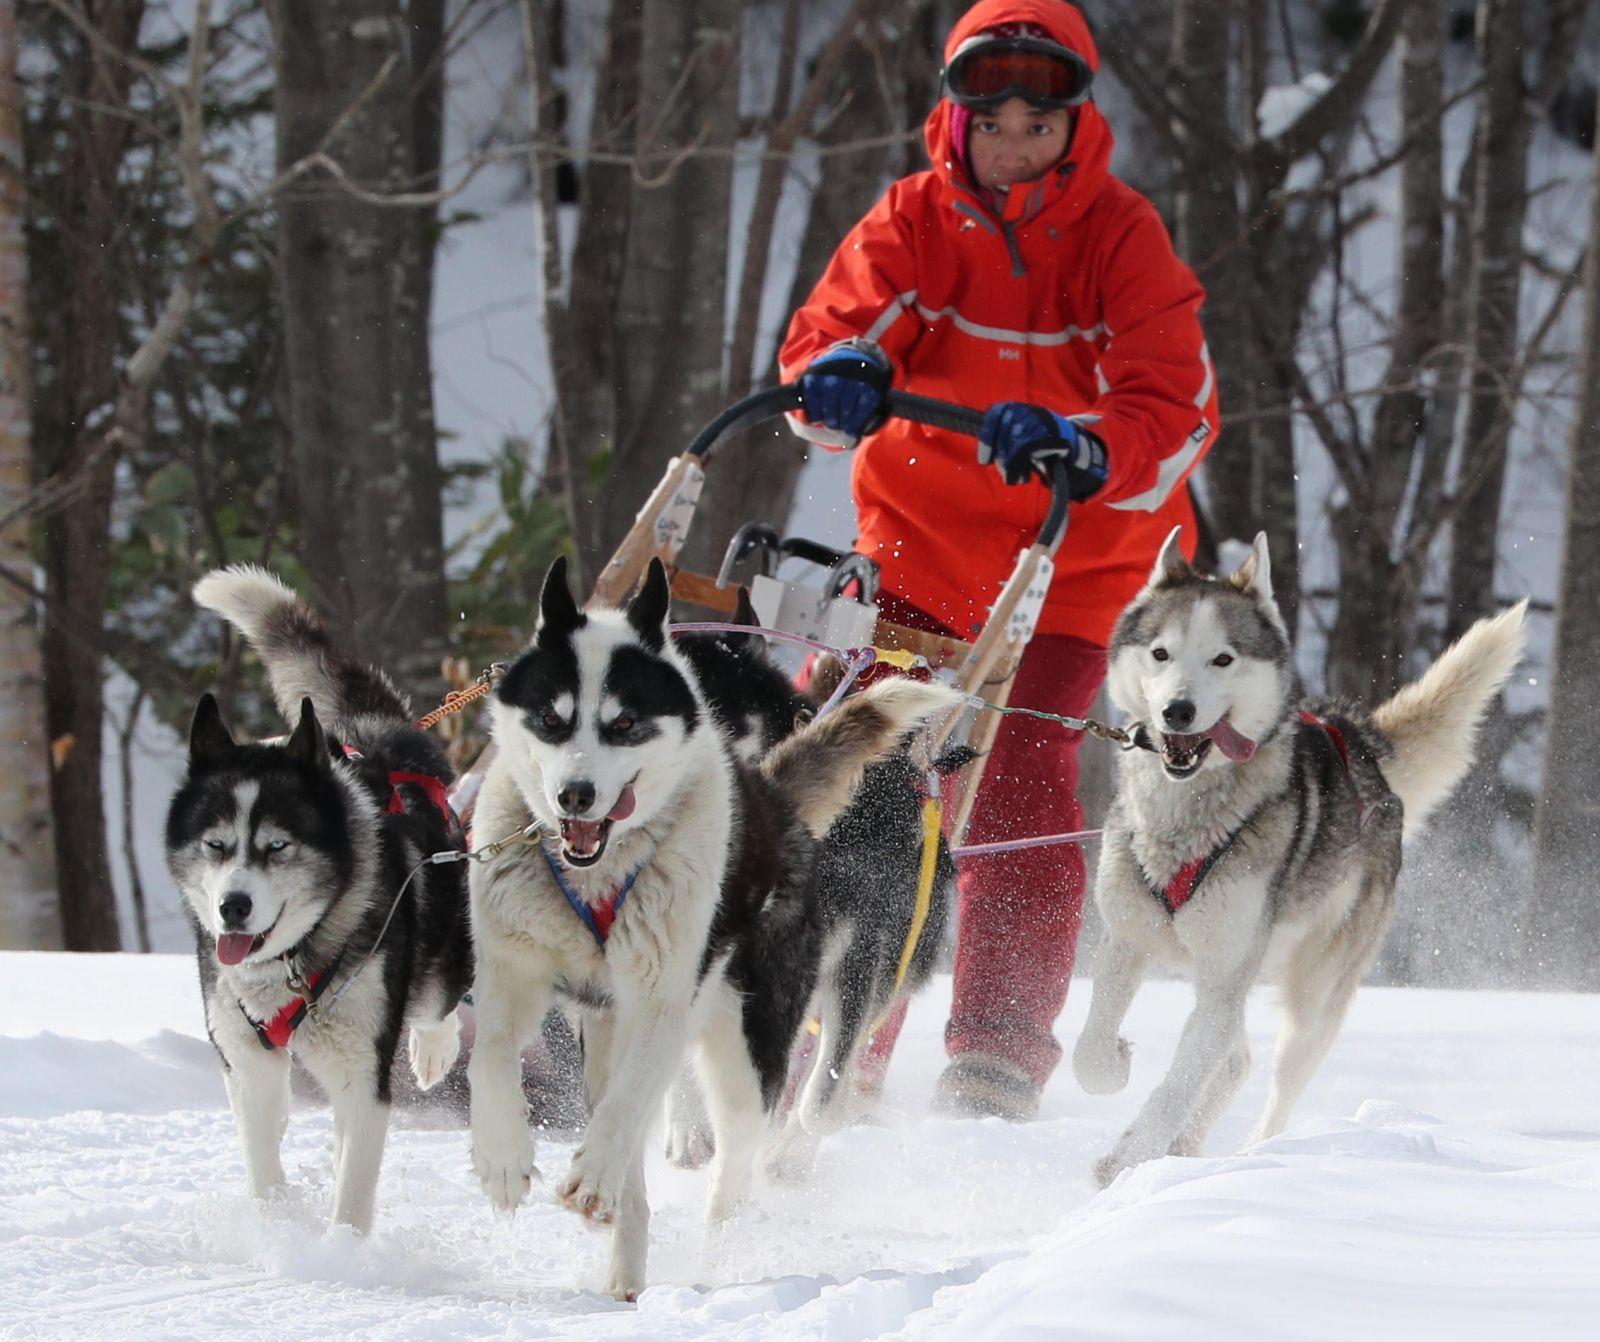 Hokkaido Sled Dogs Build Trust with Their Snow Tracks